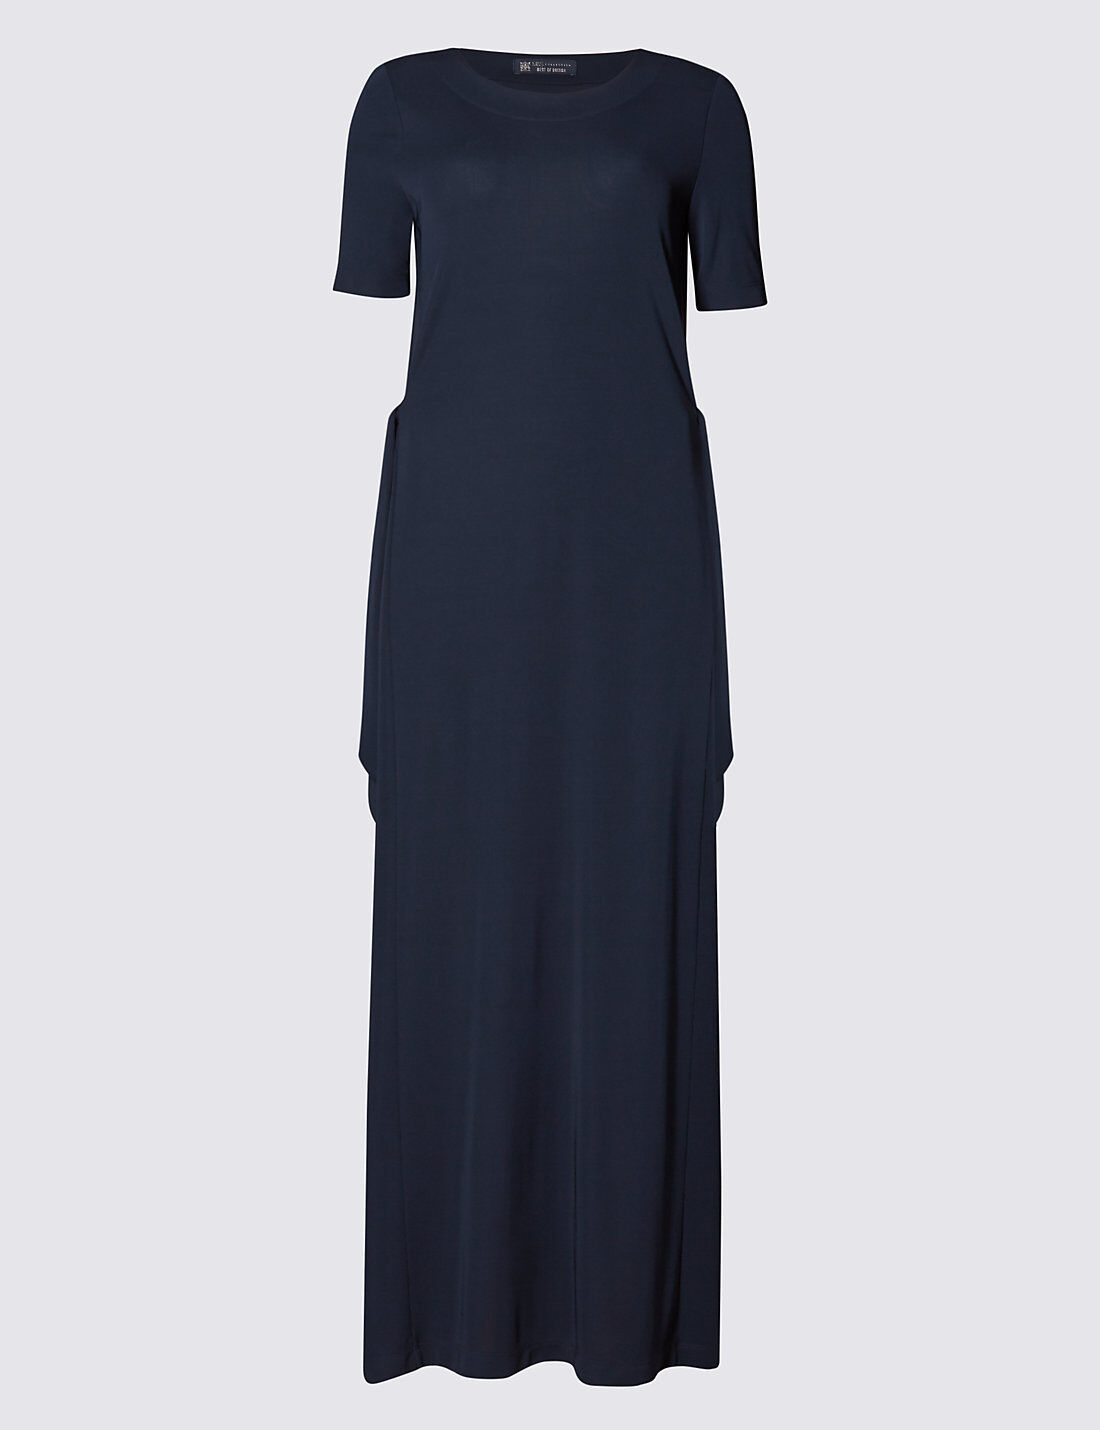 New M&S Best Of British Navy Crepe Maxi Dress Sz